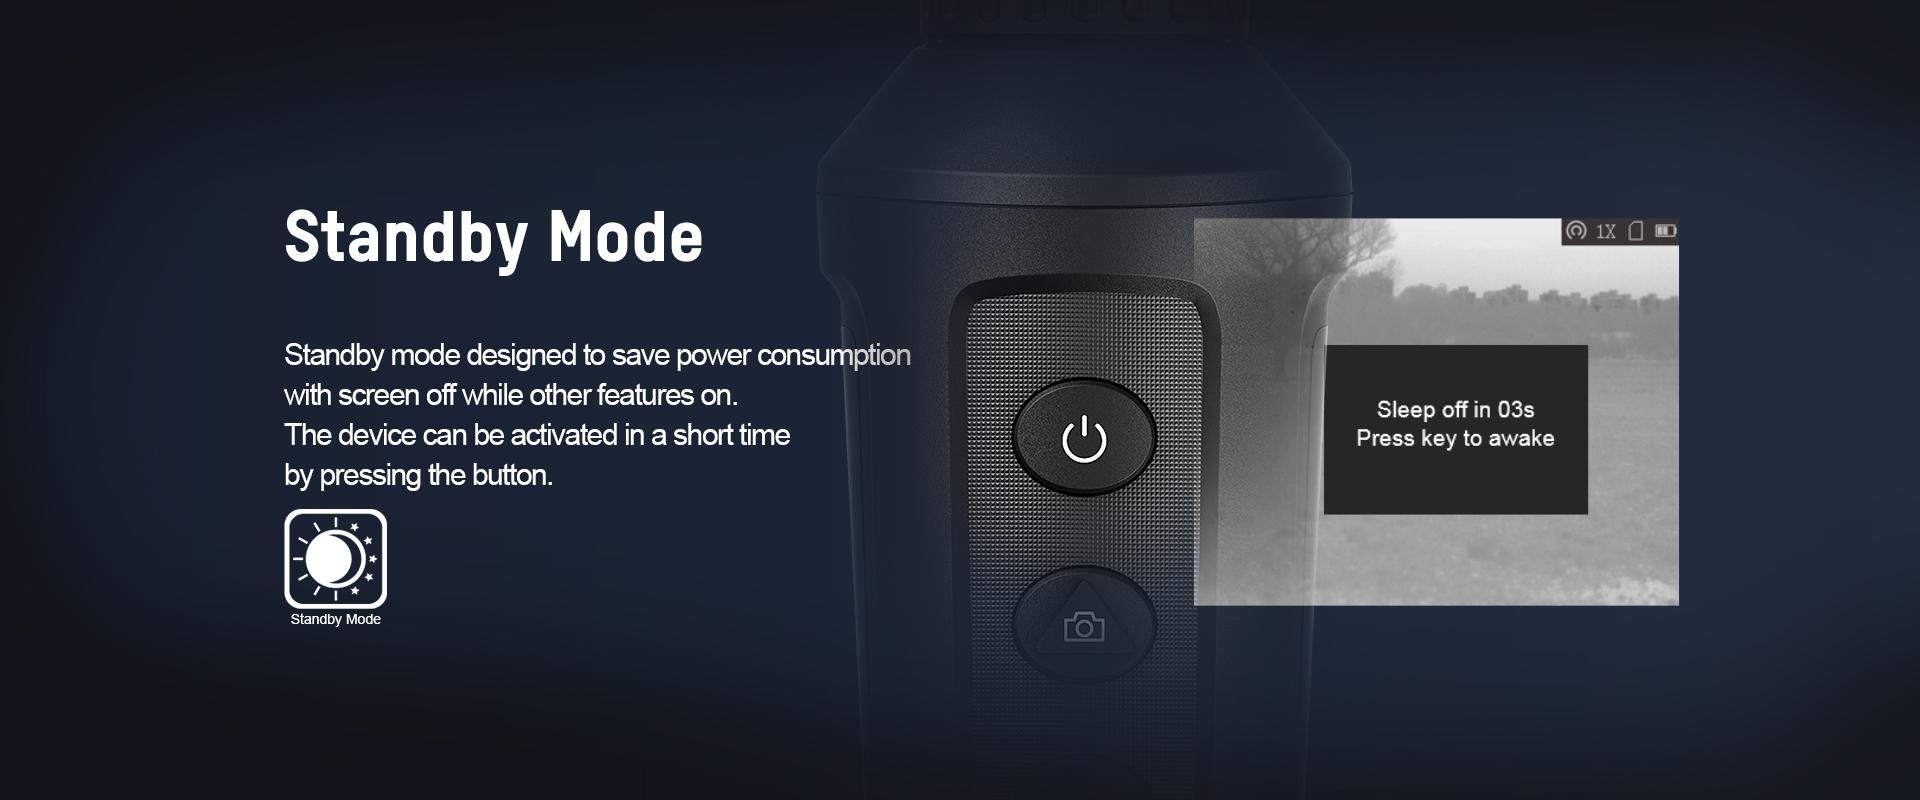 05-Standby Mode-LYNX.jpg